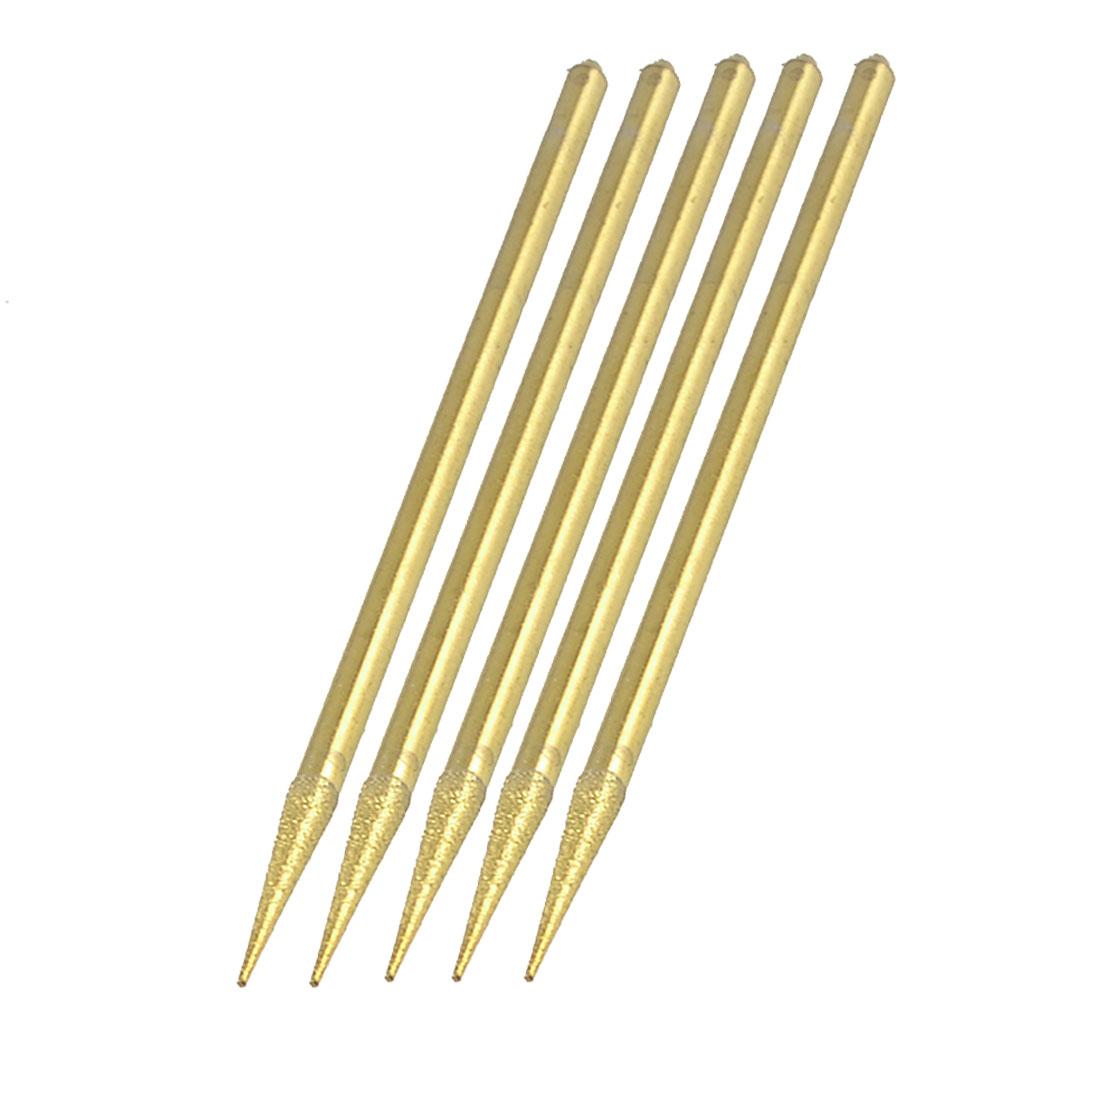 3mm-Shank-Dia-Diamond-Coated-Tip-Abrading-Buffing-Bits-80mm-Length-5-Pcs